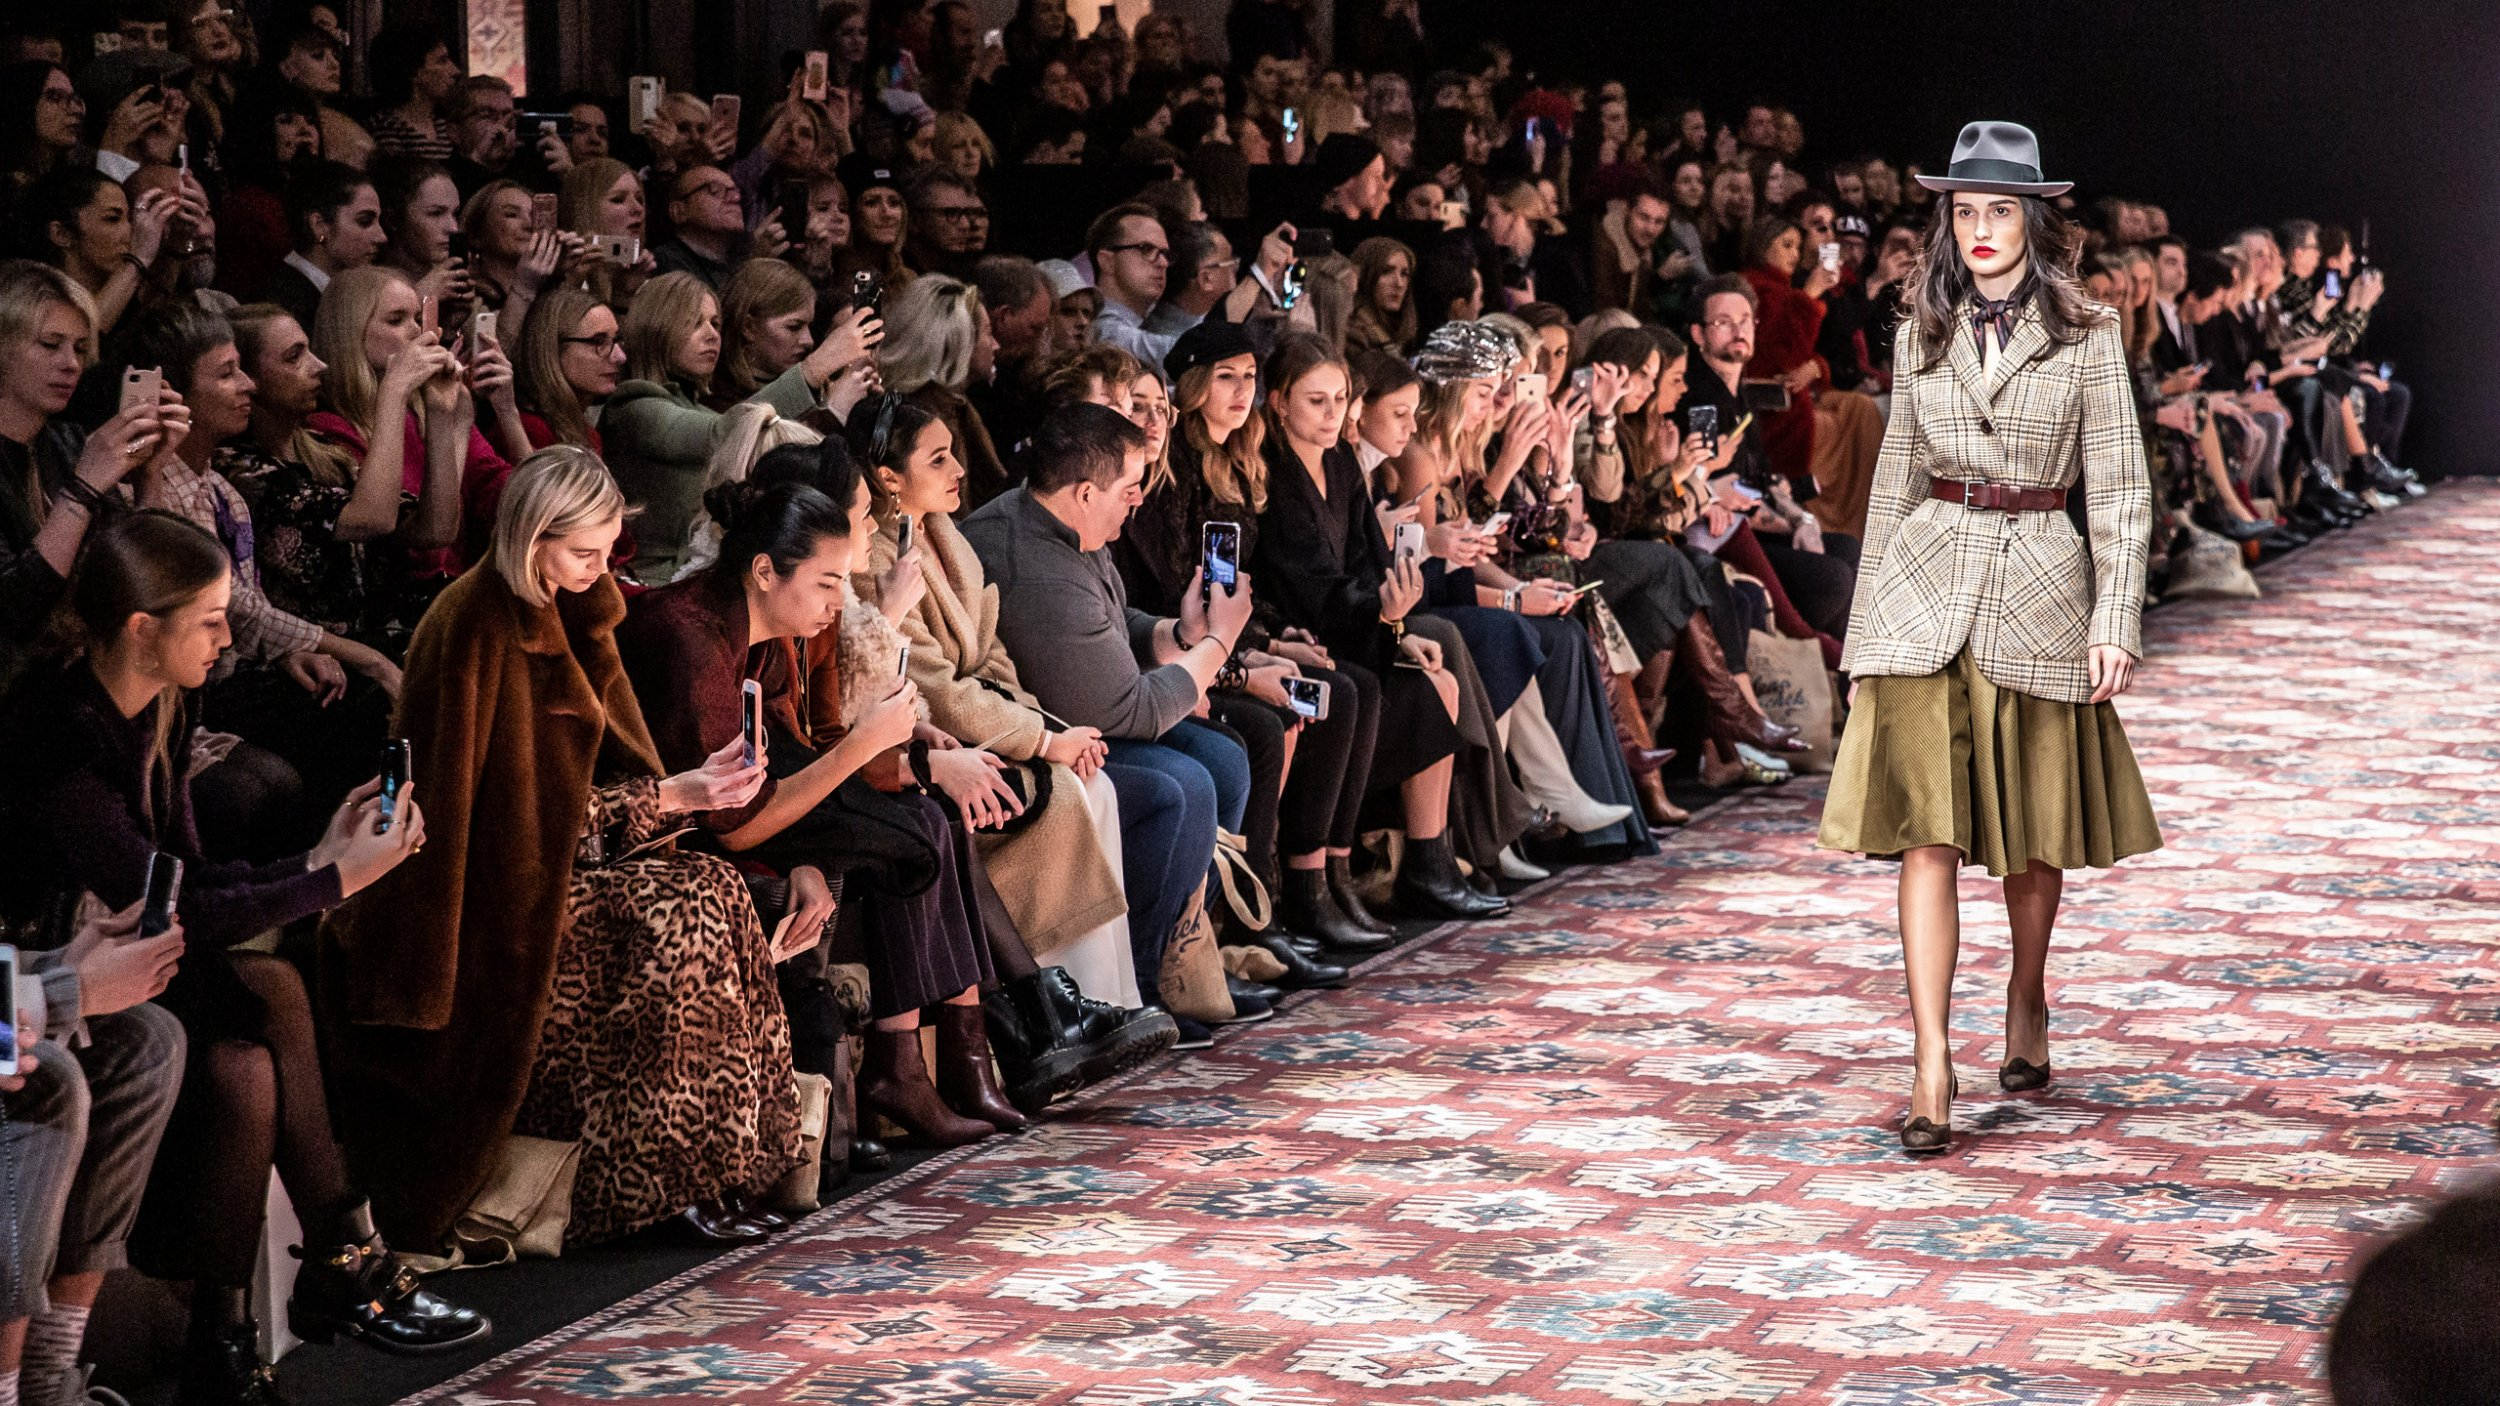 https://cloud.mb-lounge.com/files/HQ-Events/Lifestyle/Fashion/event-calendar-fashion-week-berlin-2-2560x1440.jpg